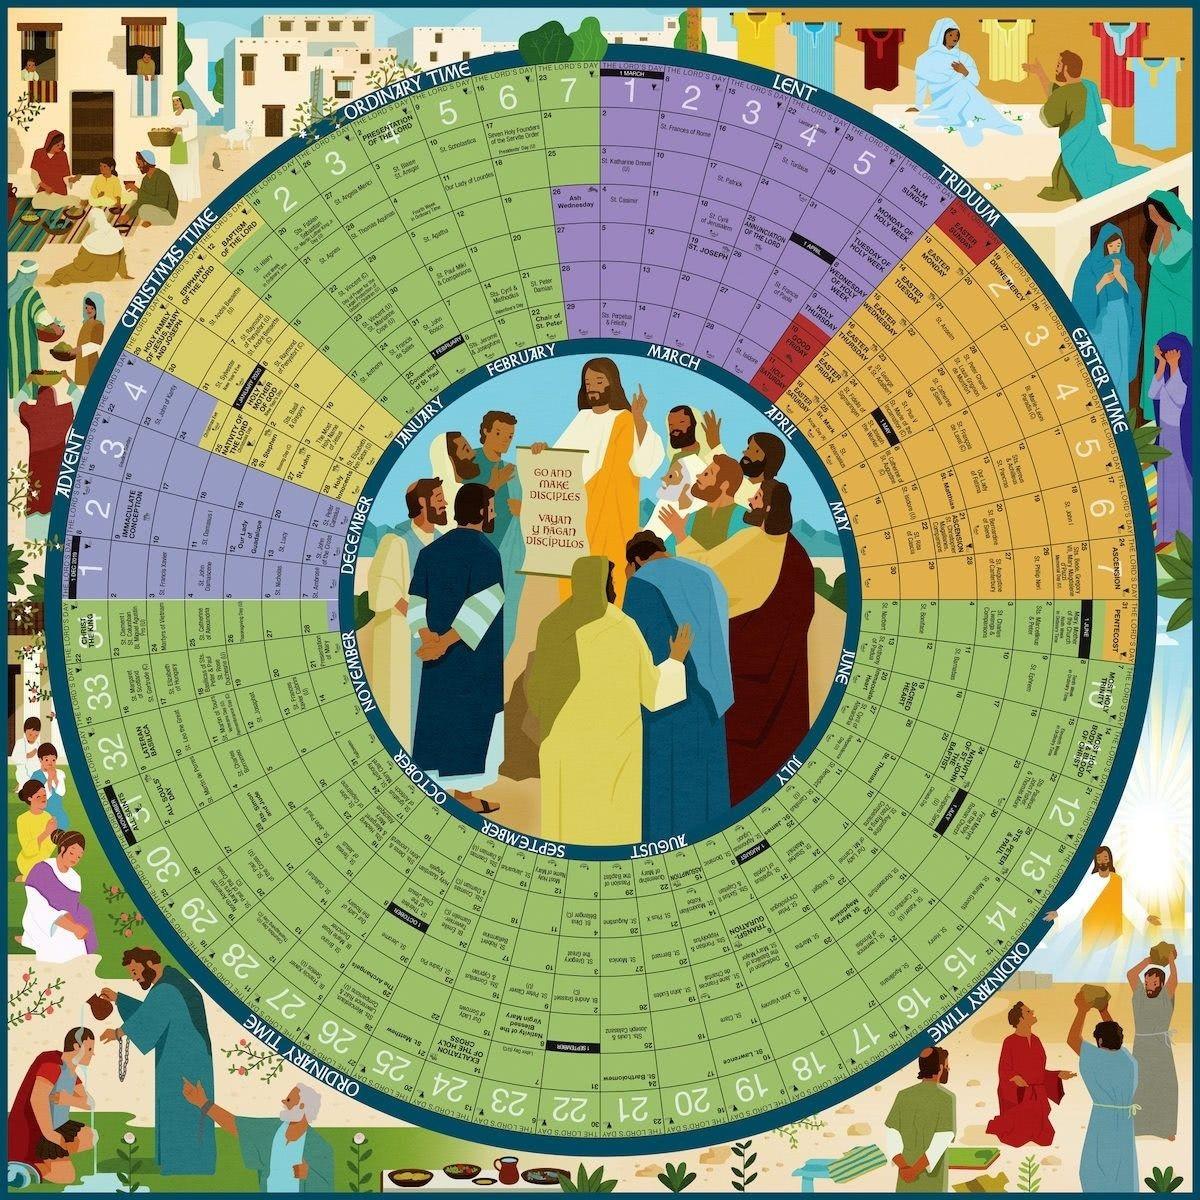 Pin By K J On Liturgical Calendar Catholic Church Focus Is-Catholic Church Year 2021